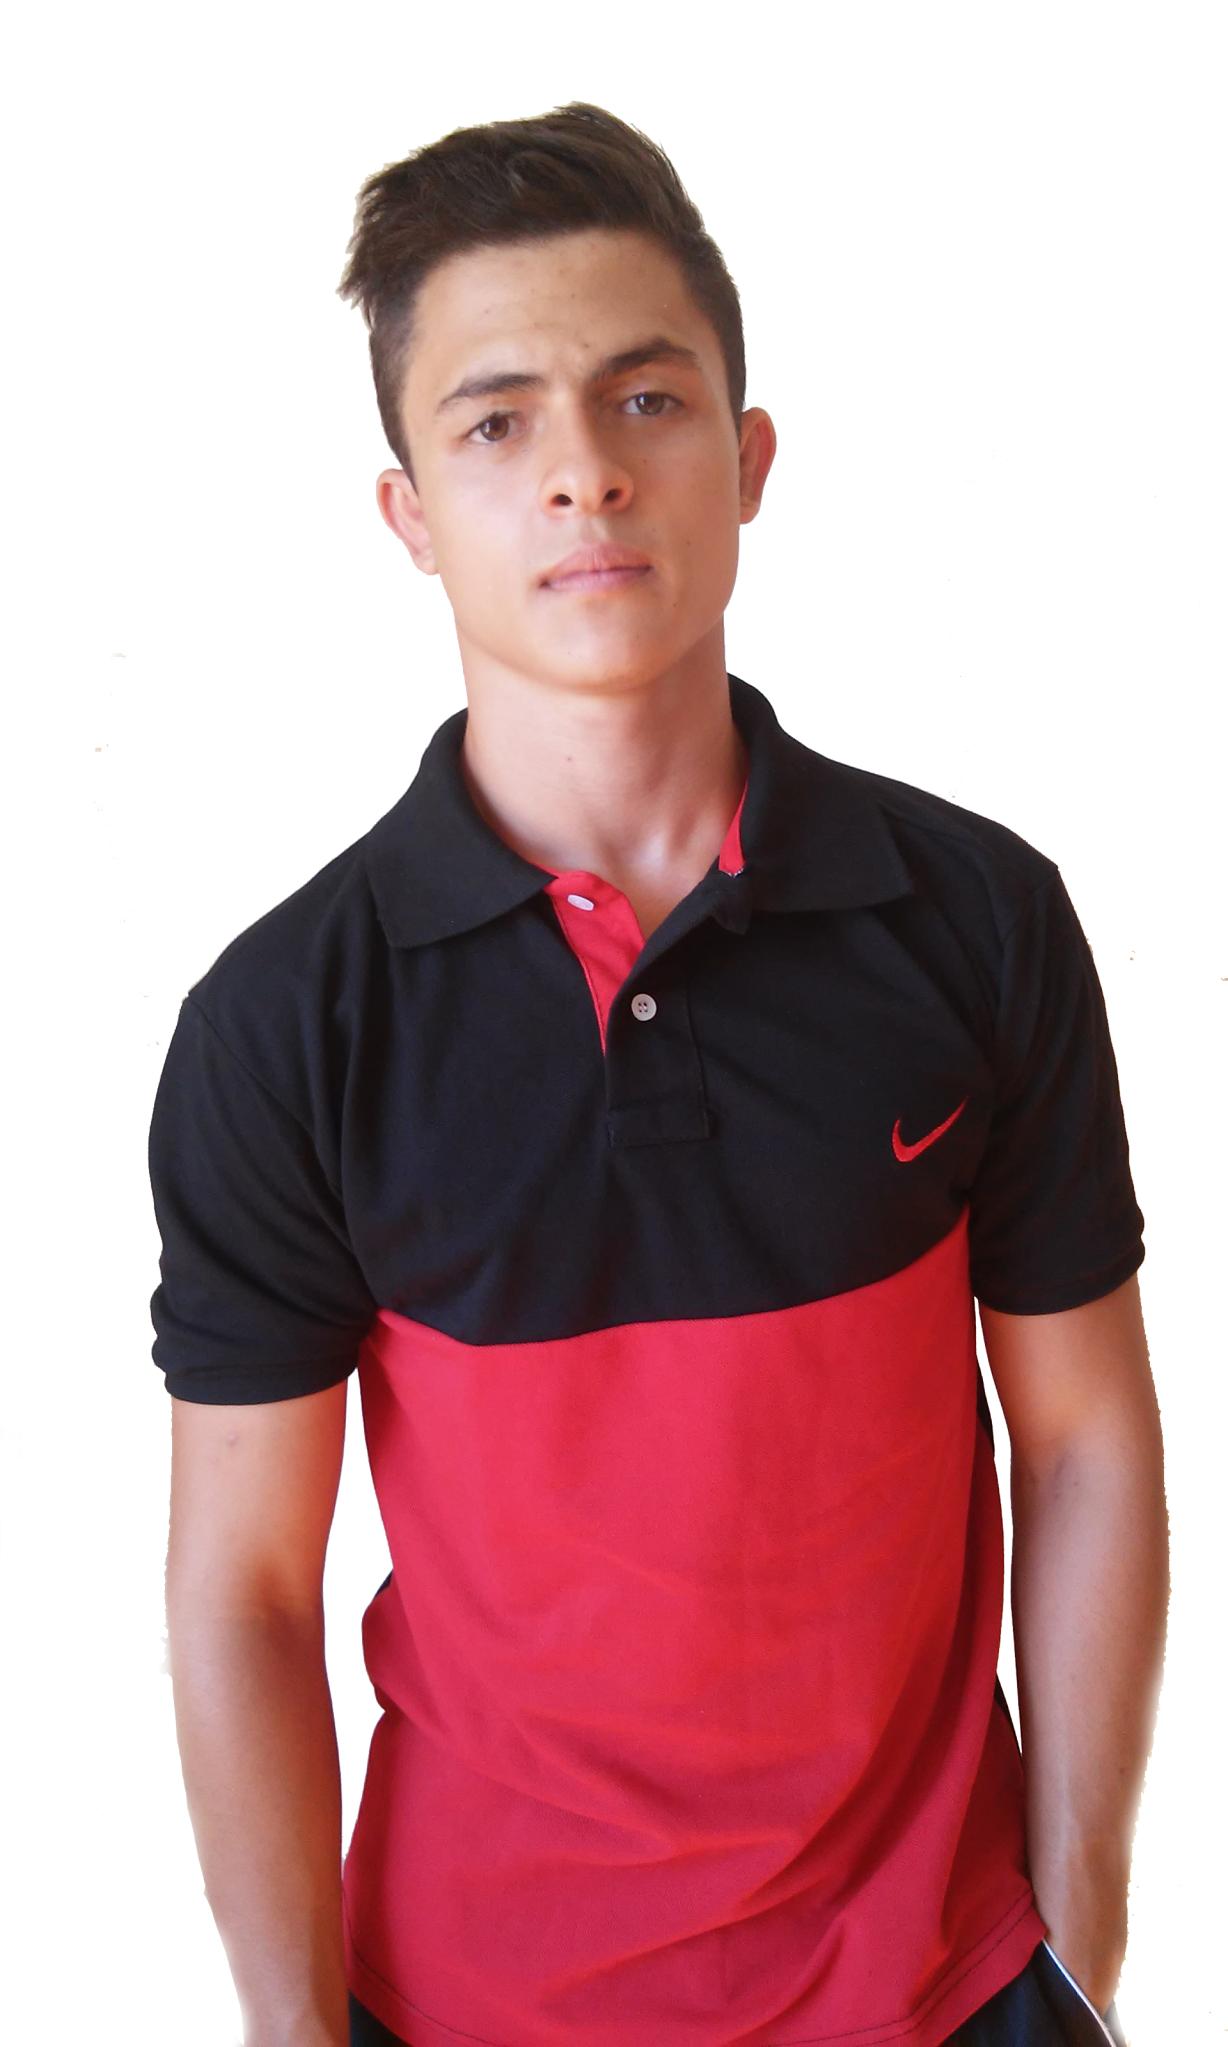 accfb5d325 A Camisa Polo Nike Fitness Xtreme - Polo Piquet Modelo Masculina - Manga  Curta é um